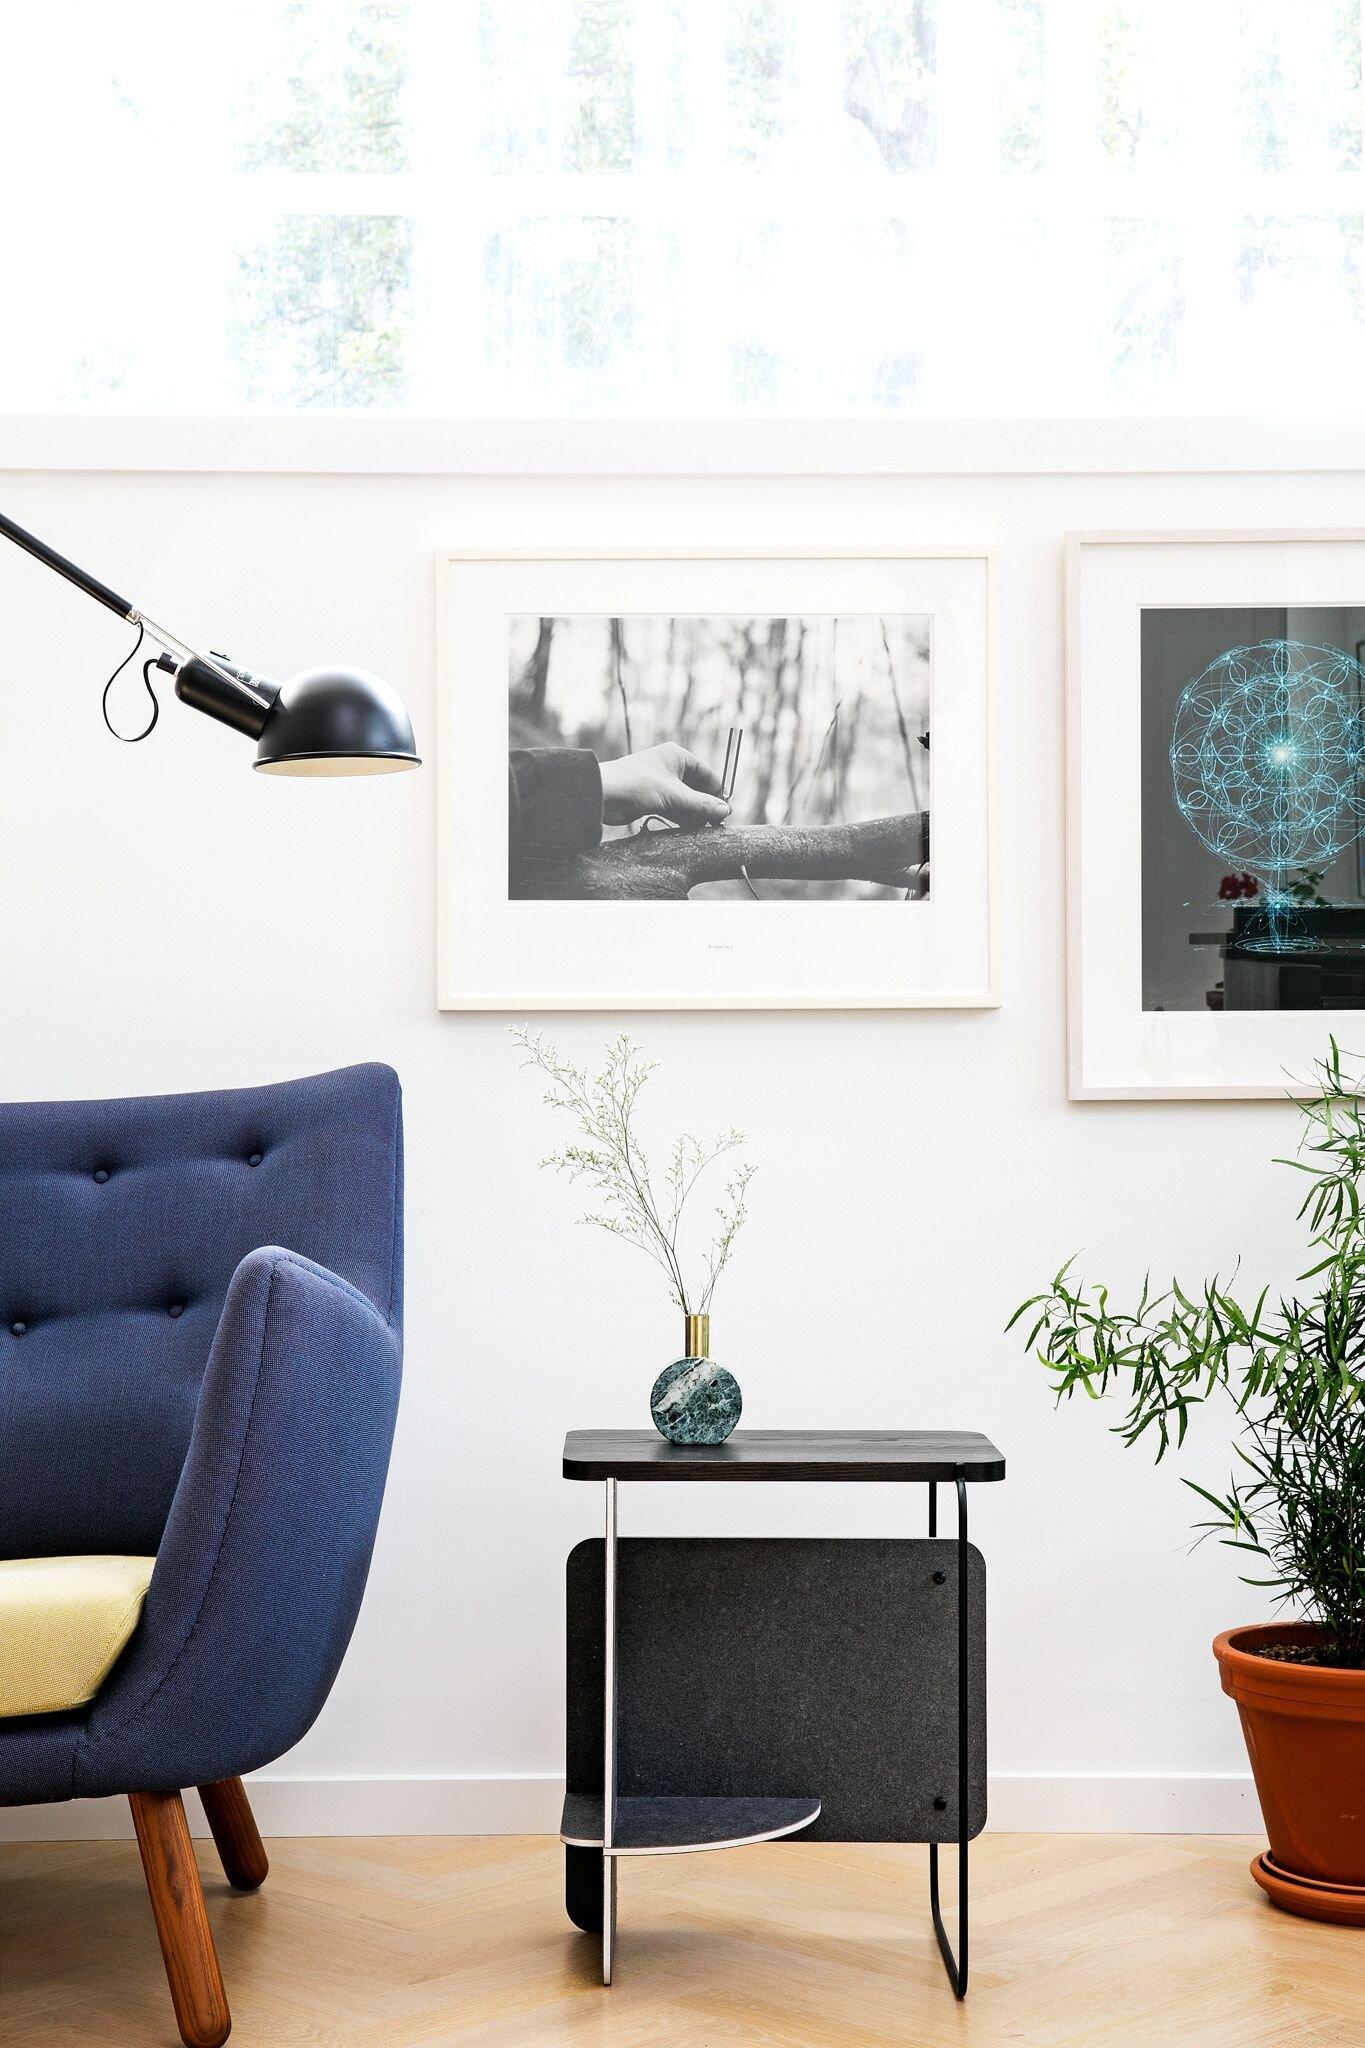 FÓLK Reykjavik — Nordique | Nordic Lifestyle | Scandinavian Design | Nordic Products